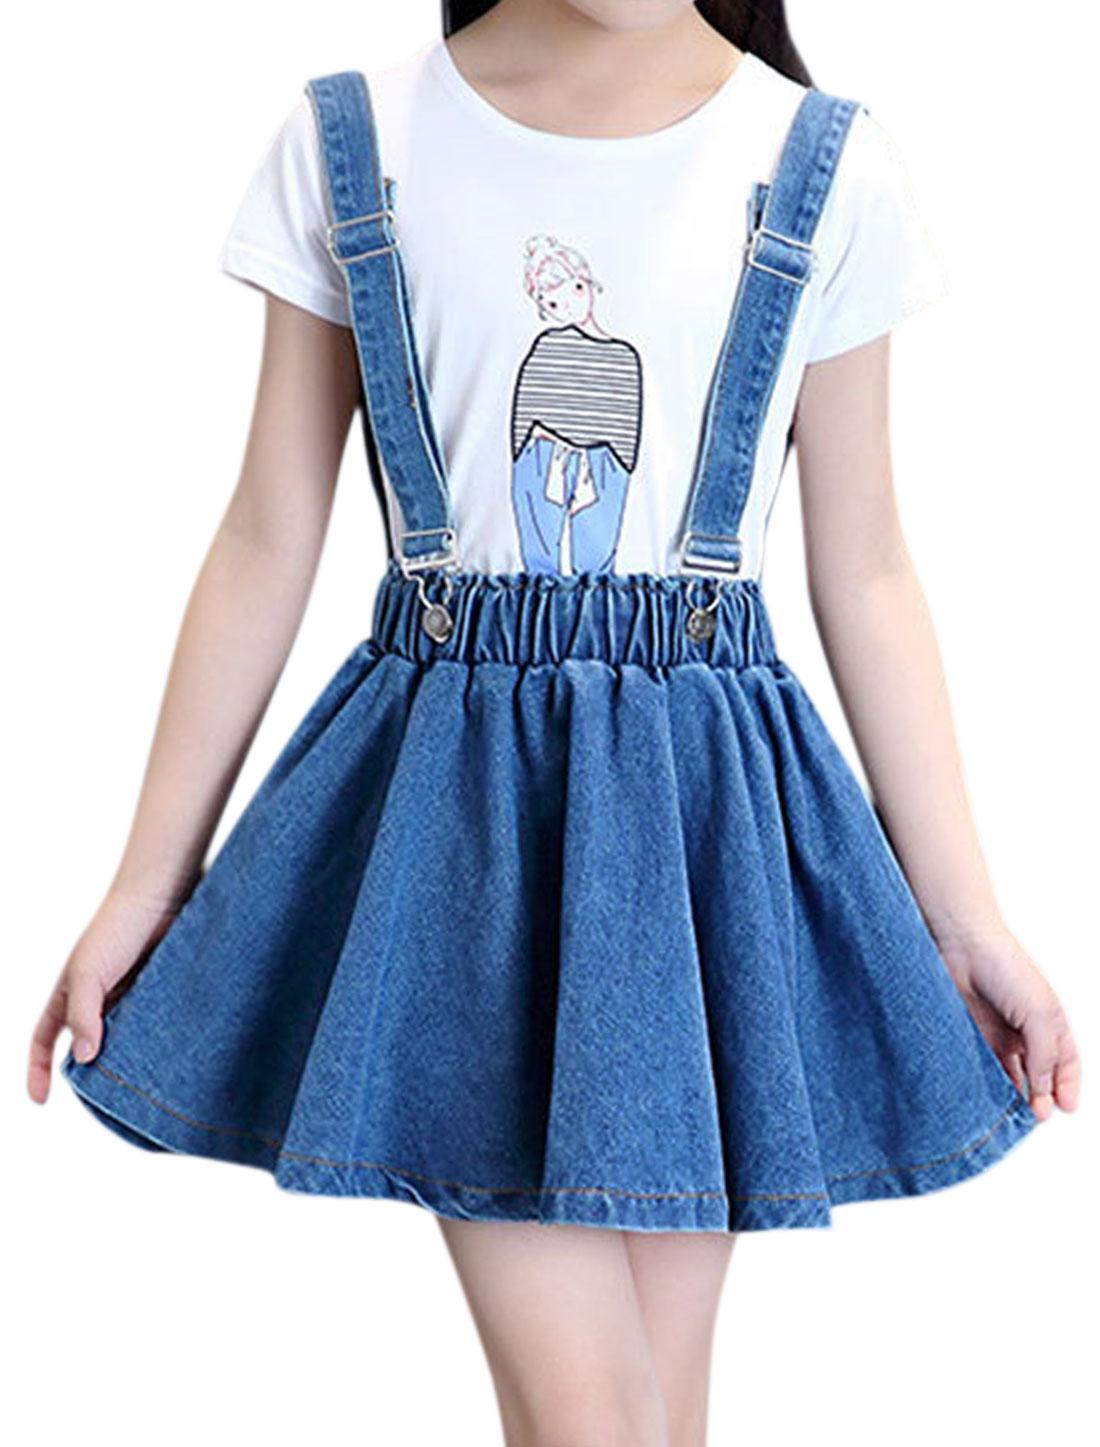 Girls Detachable Buckled Straps A Line Denim Suspender Skirt Blue 12